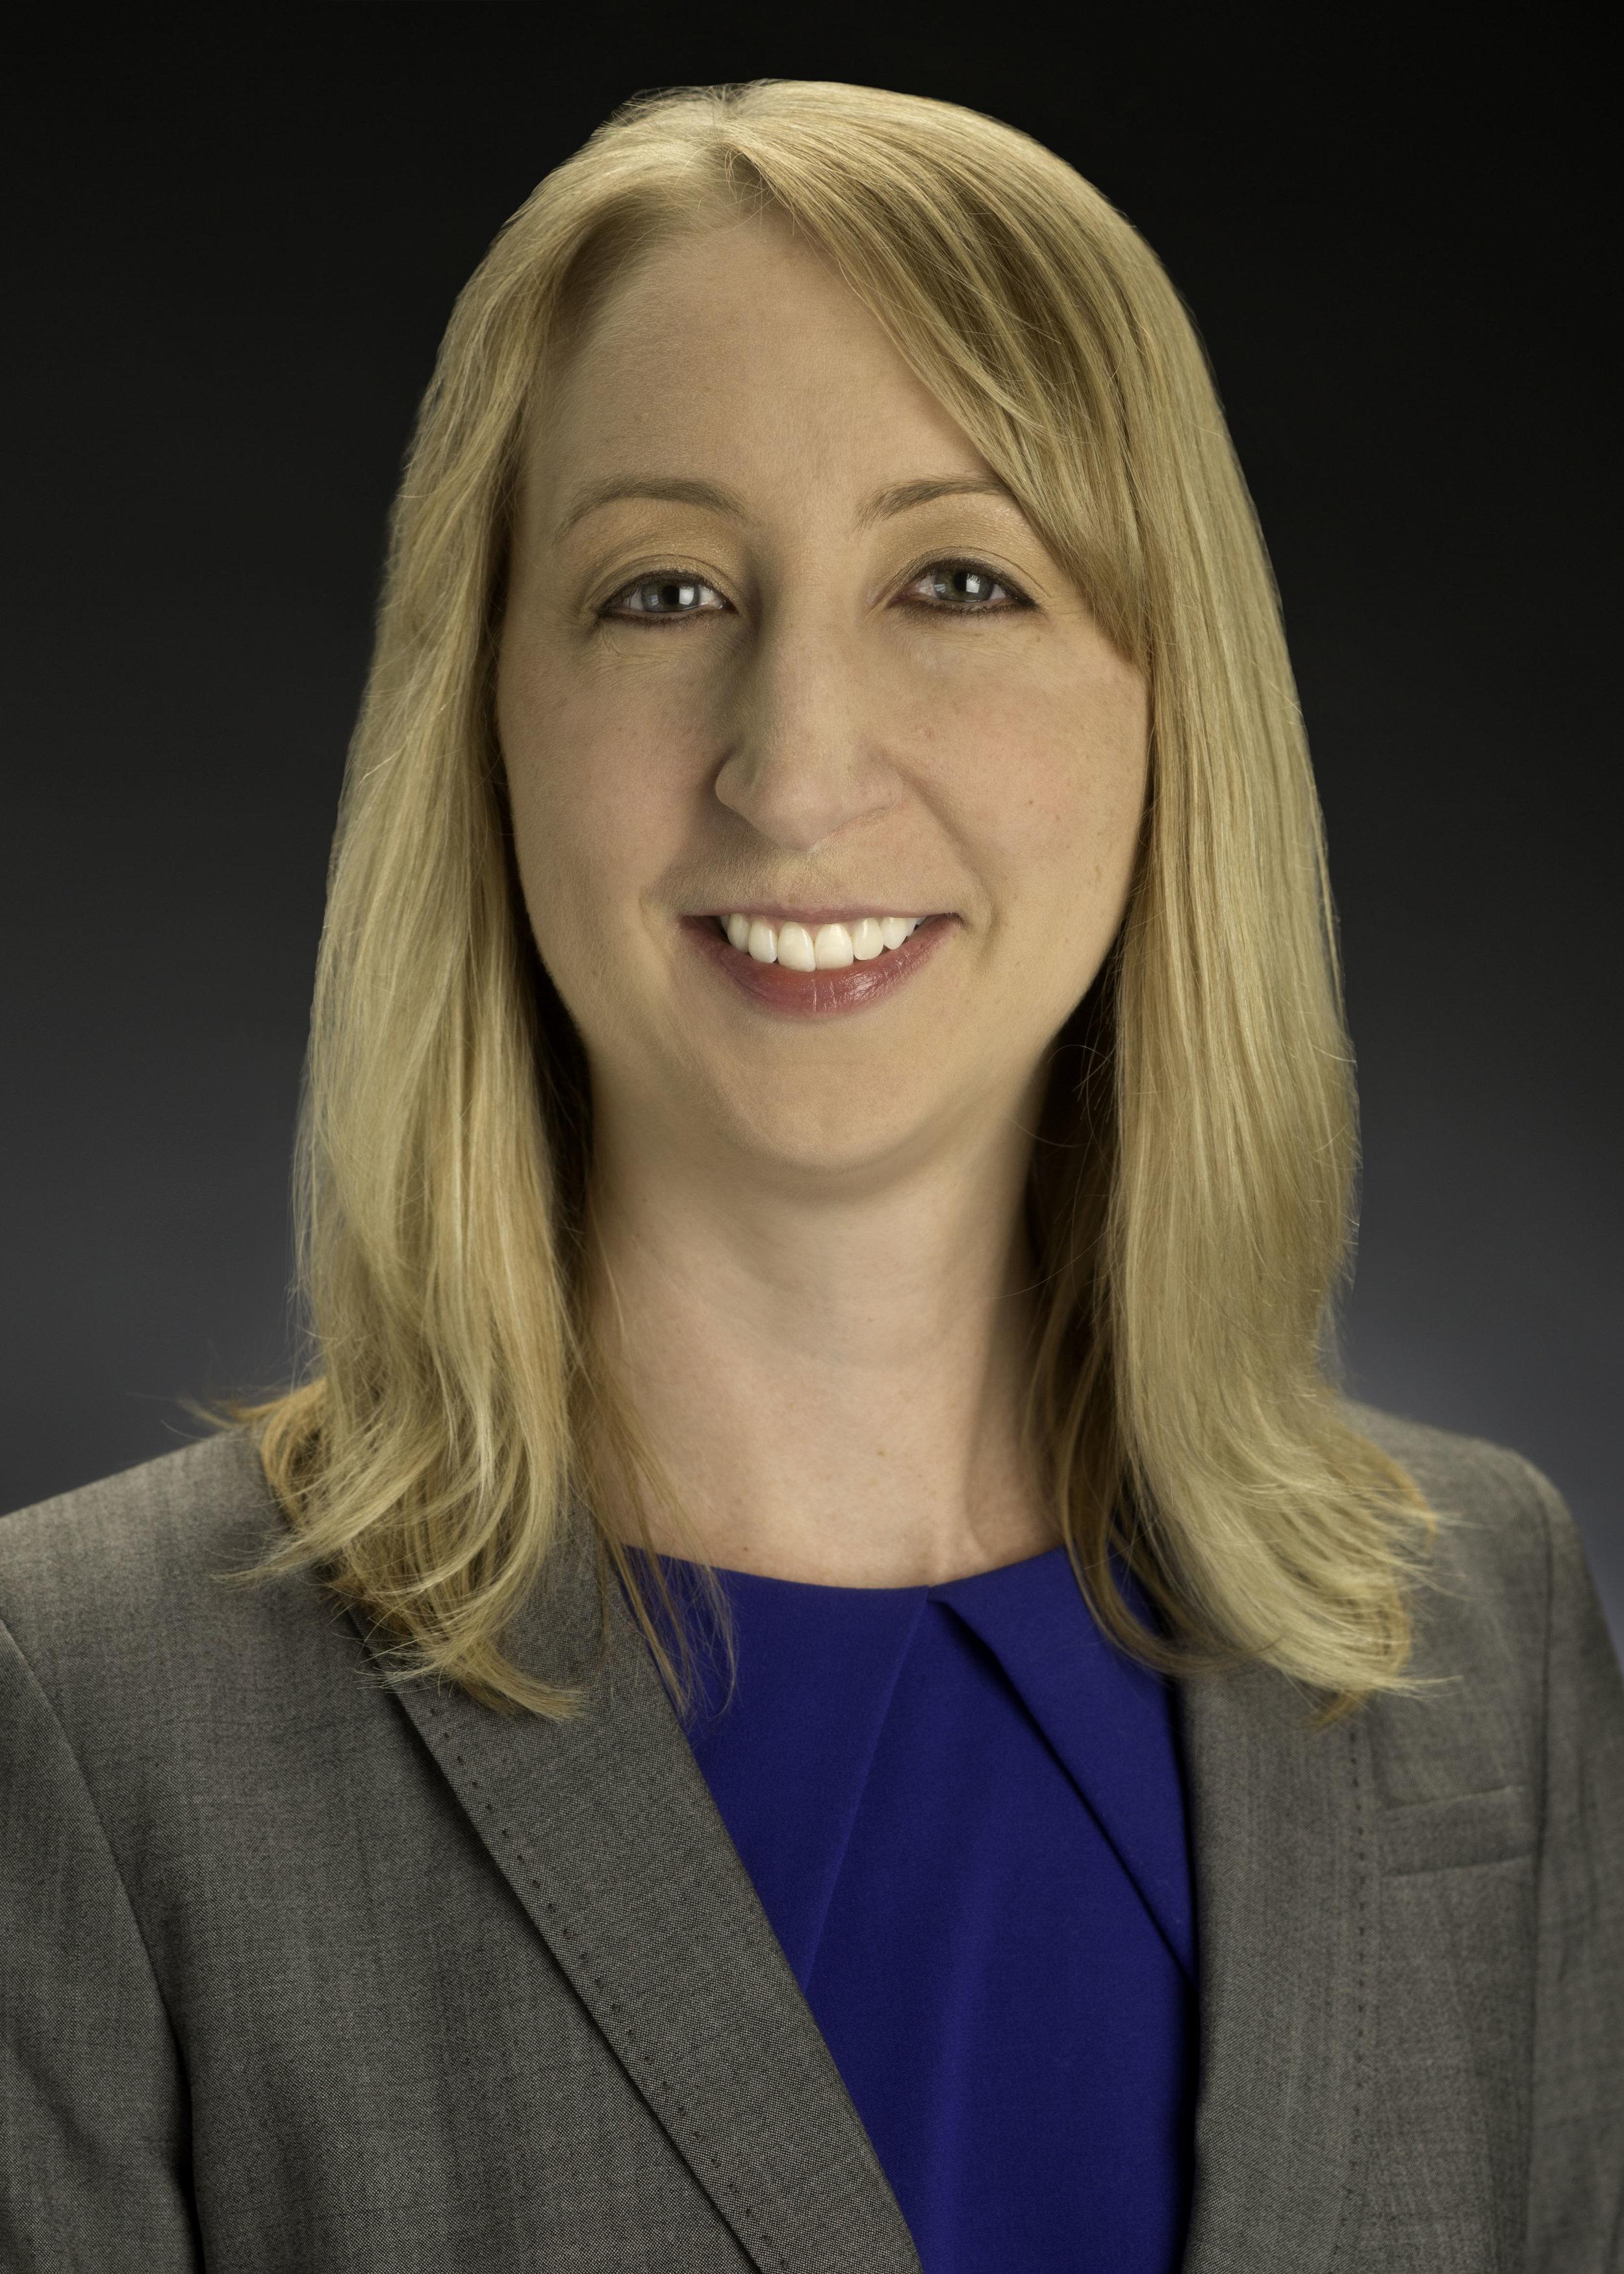 Alisa Wilson - Vice President